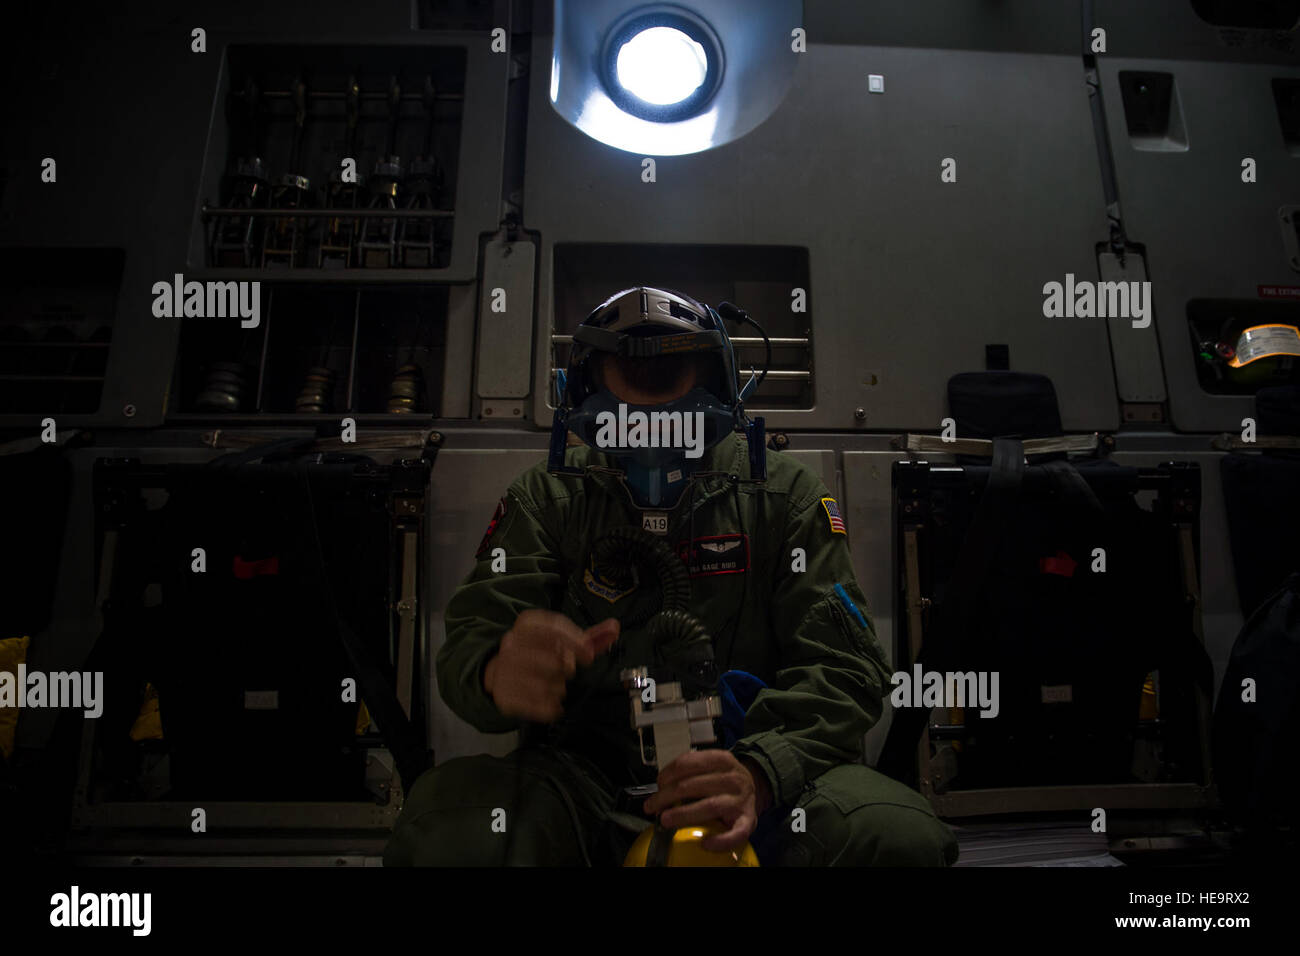 U.S. Air Force Reserve Senior Airman Gage Bird, a medical evacuation technician with the 914th Aeromedical Evacuation Stock Photo